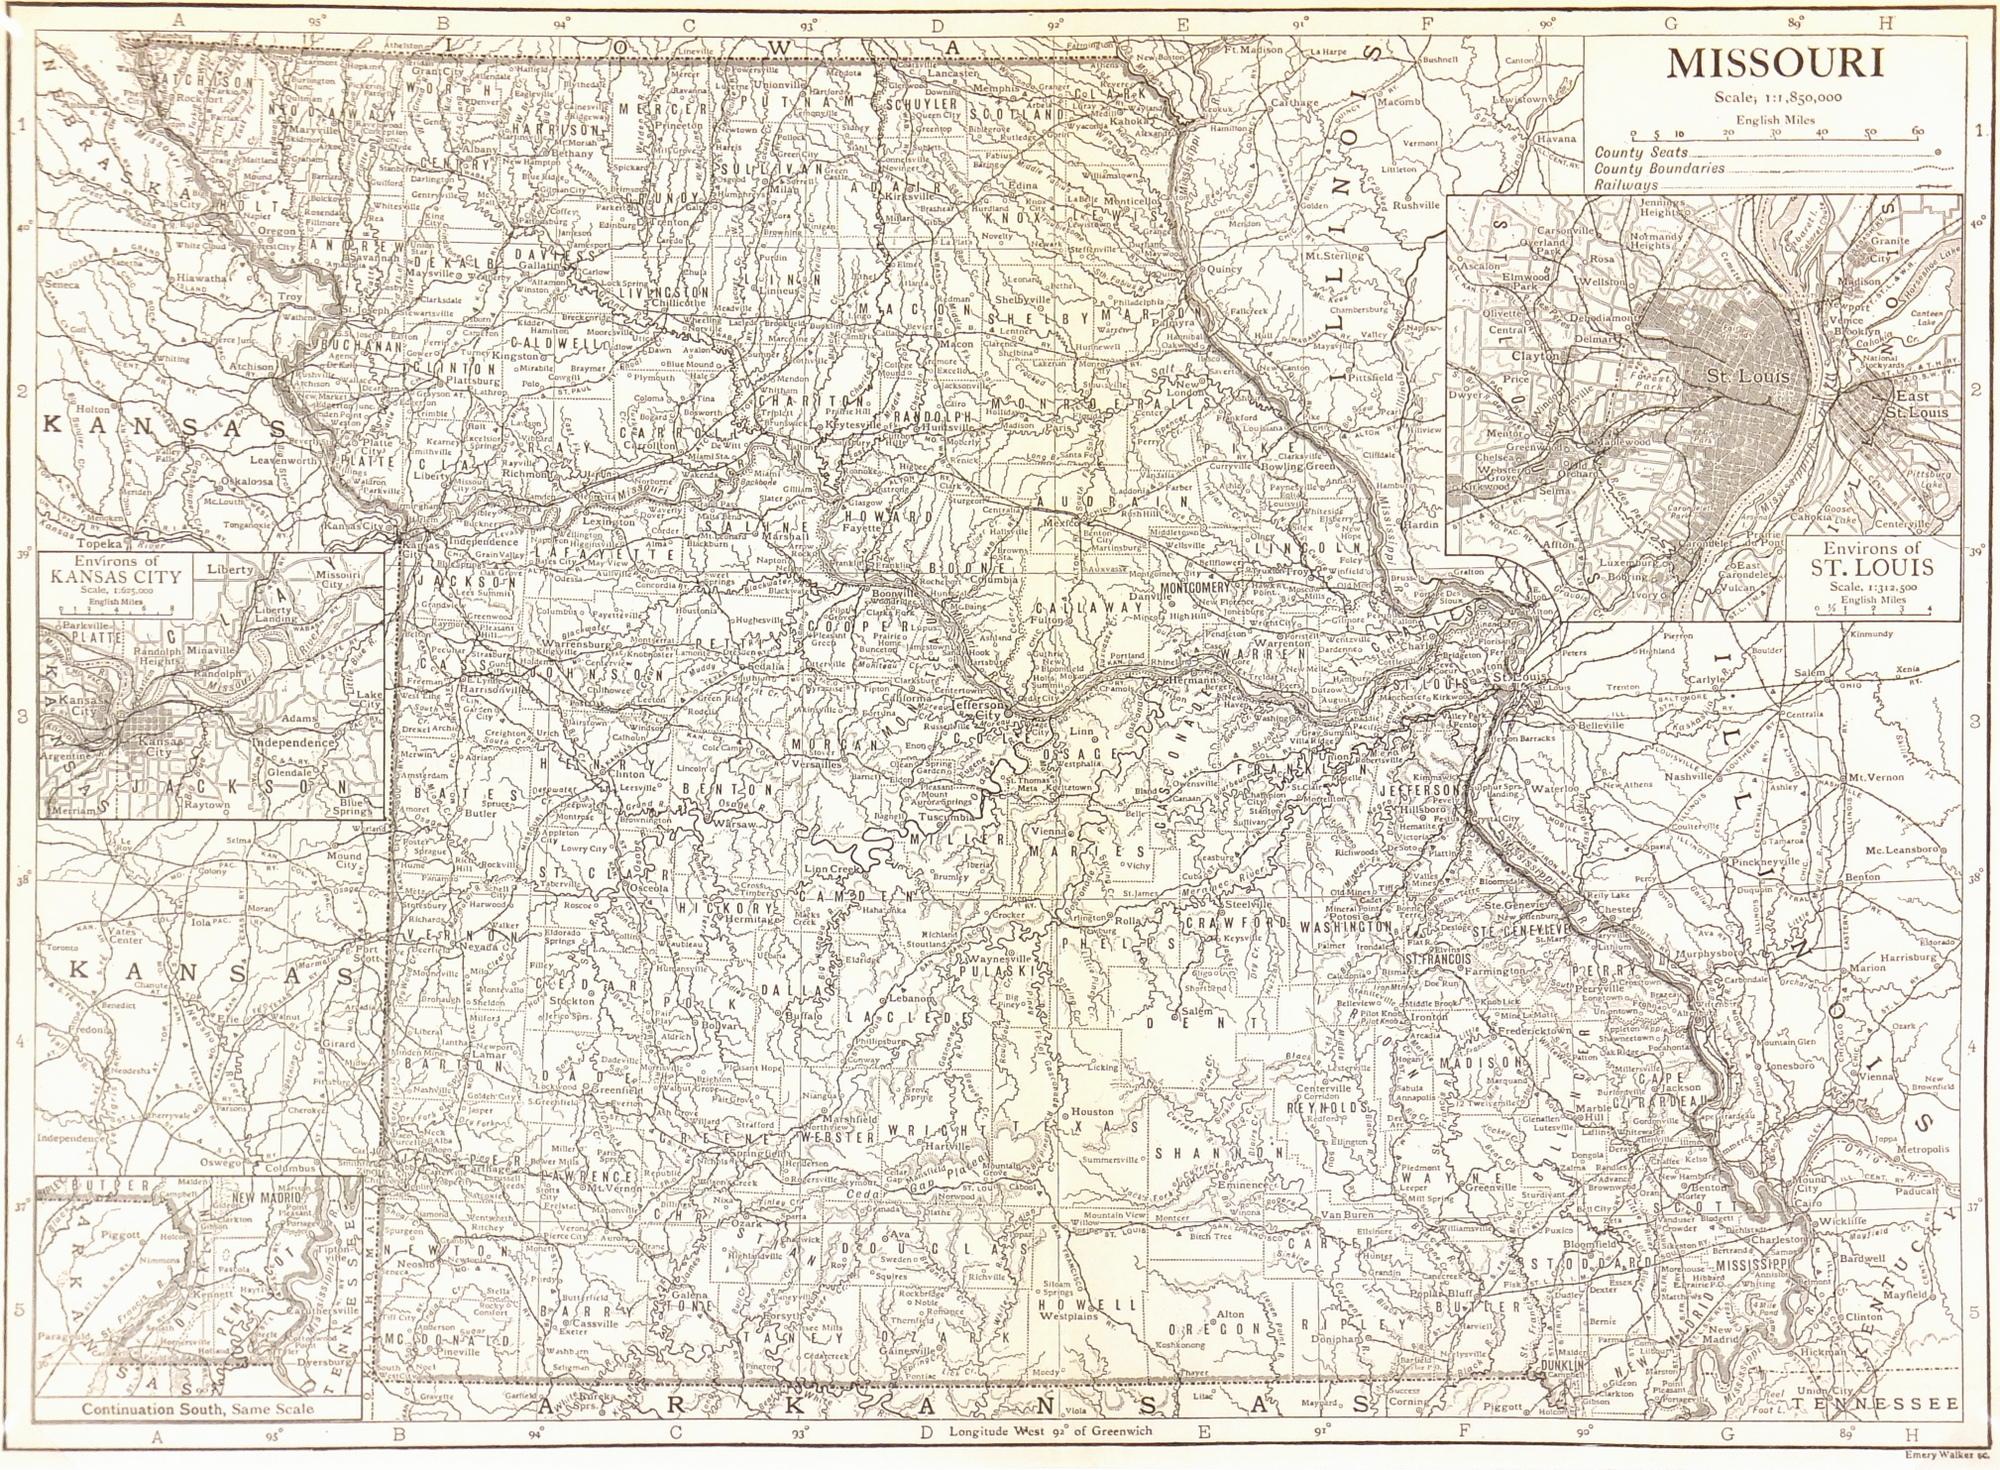 Missouri Map, 1910-main-7403K